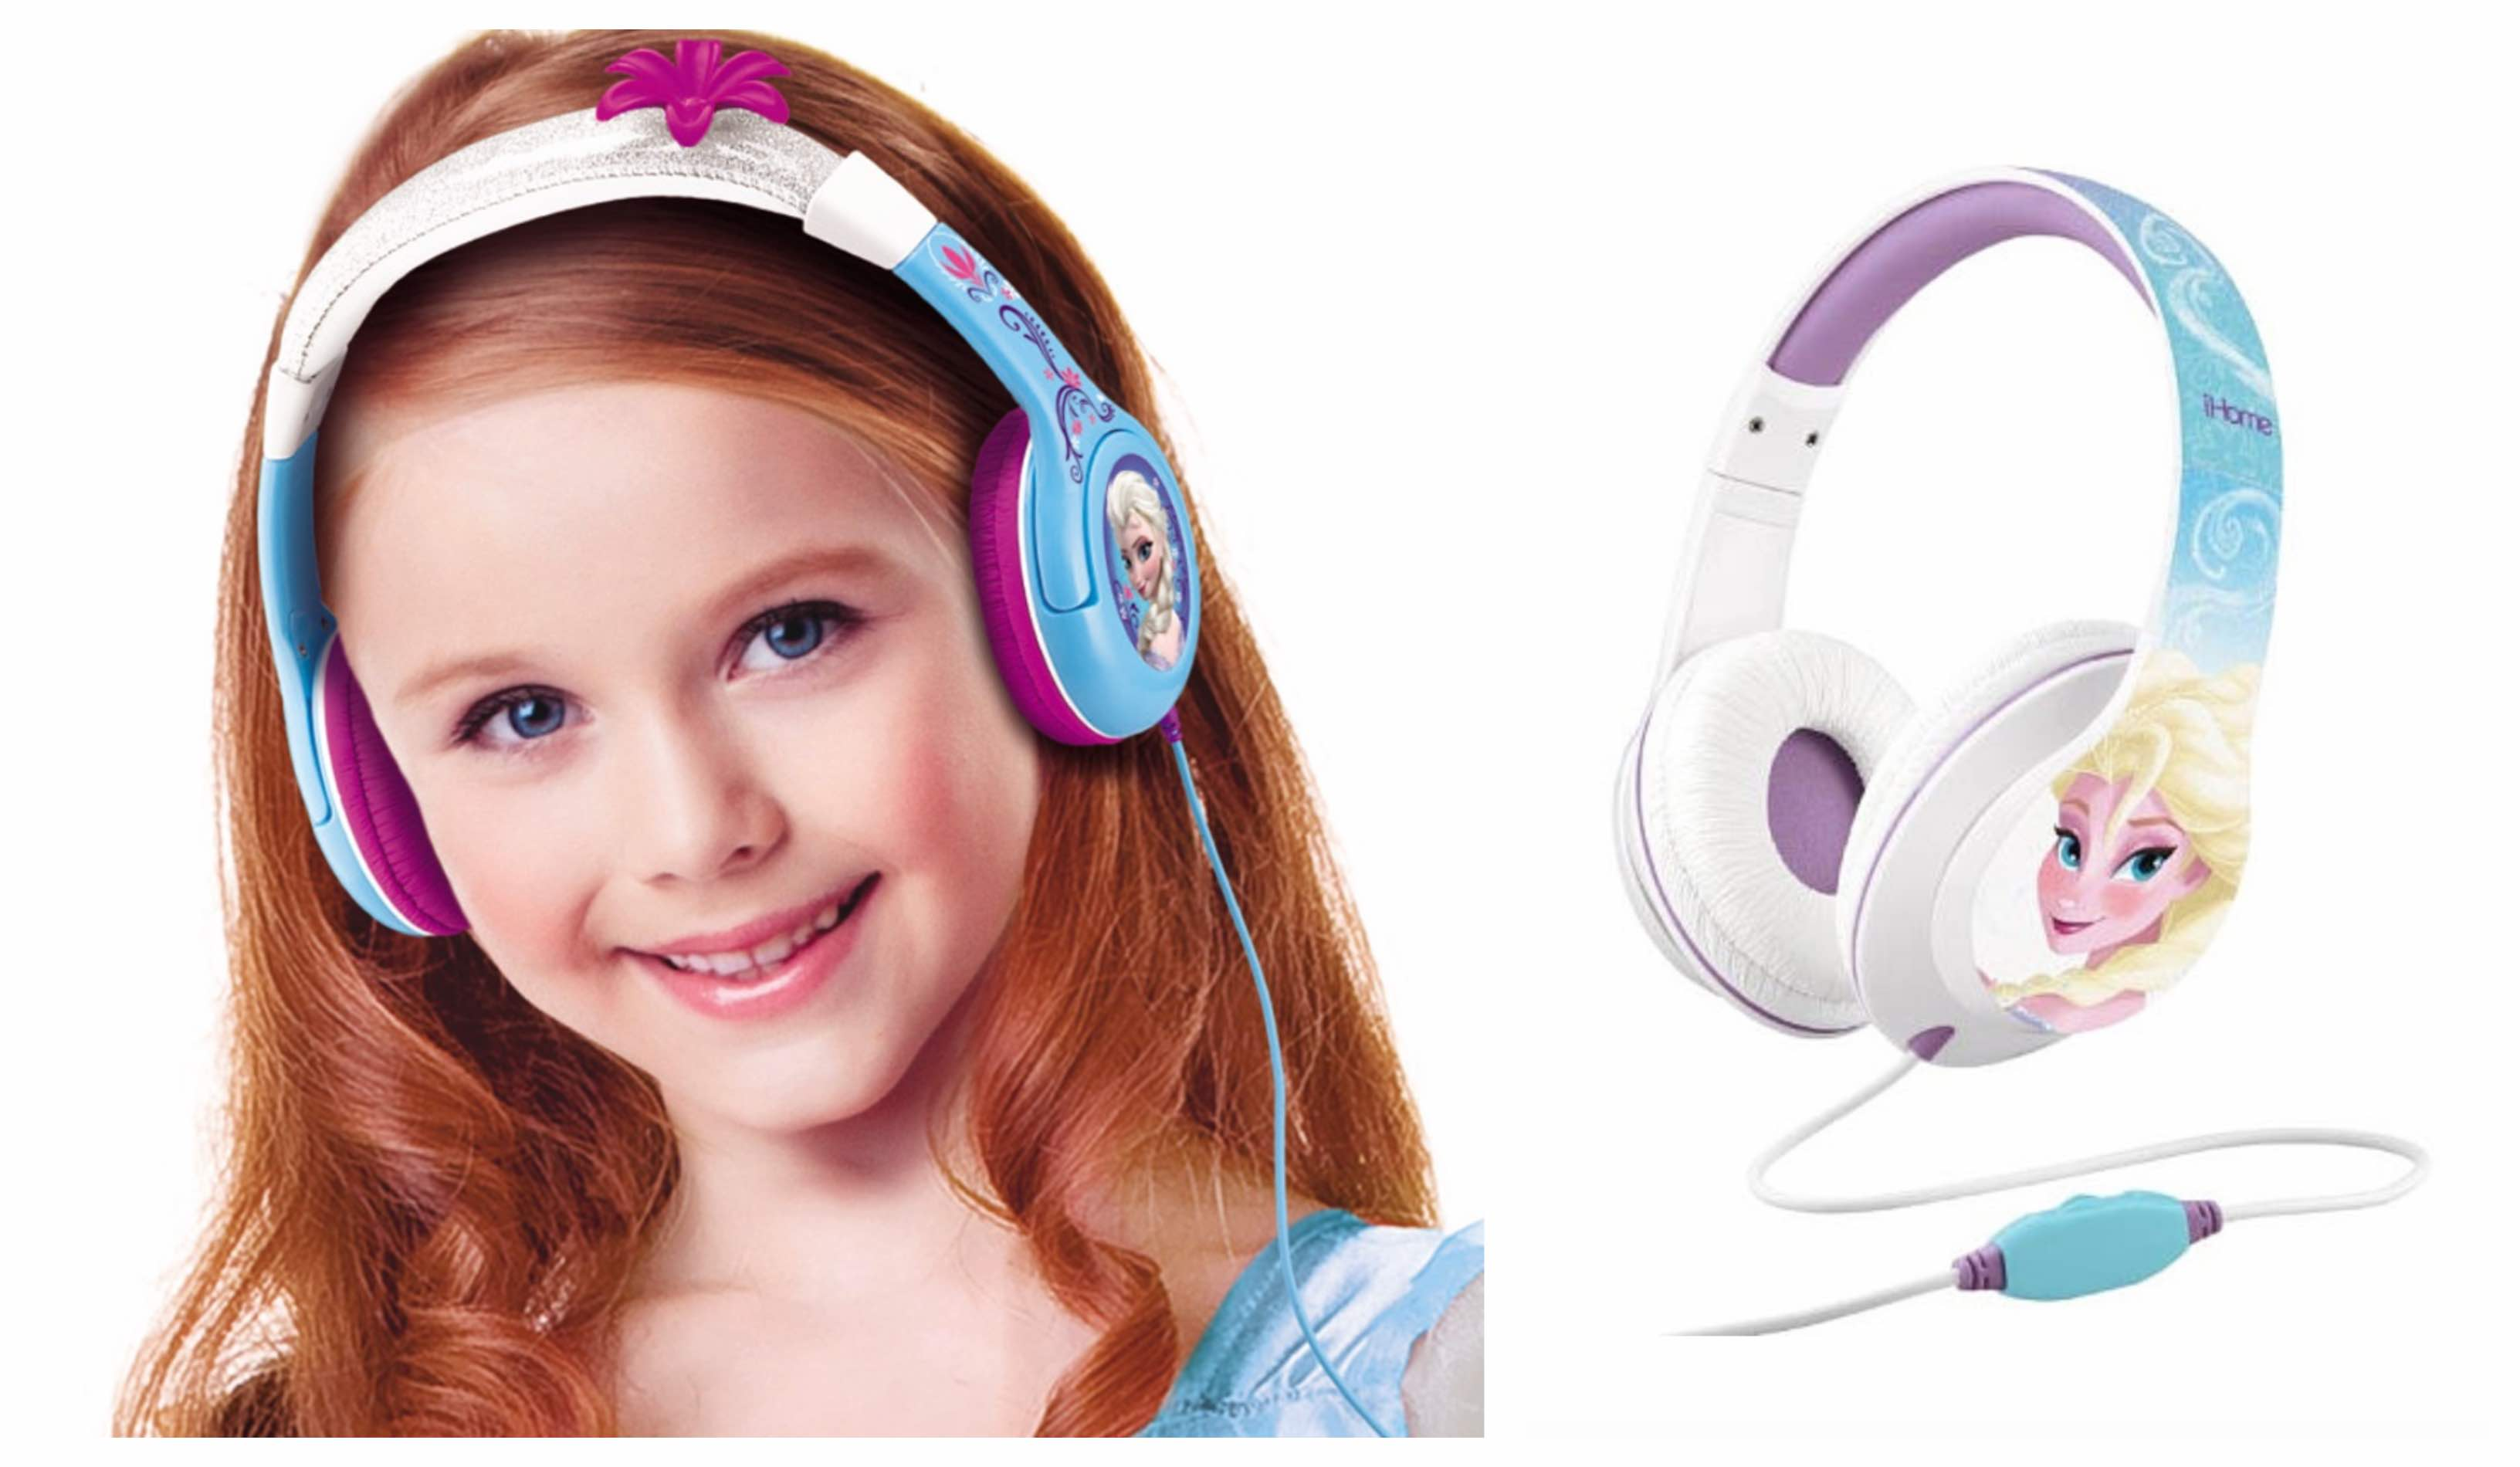 frost høretelefoner, elsa høretelefoner, anna høretelefoner, frost hovedtelefoner, frost headset, elsa headset, anna headset, frost høretelefoner til børn